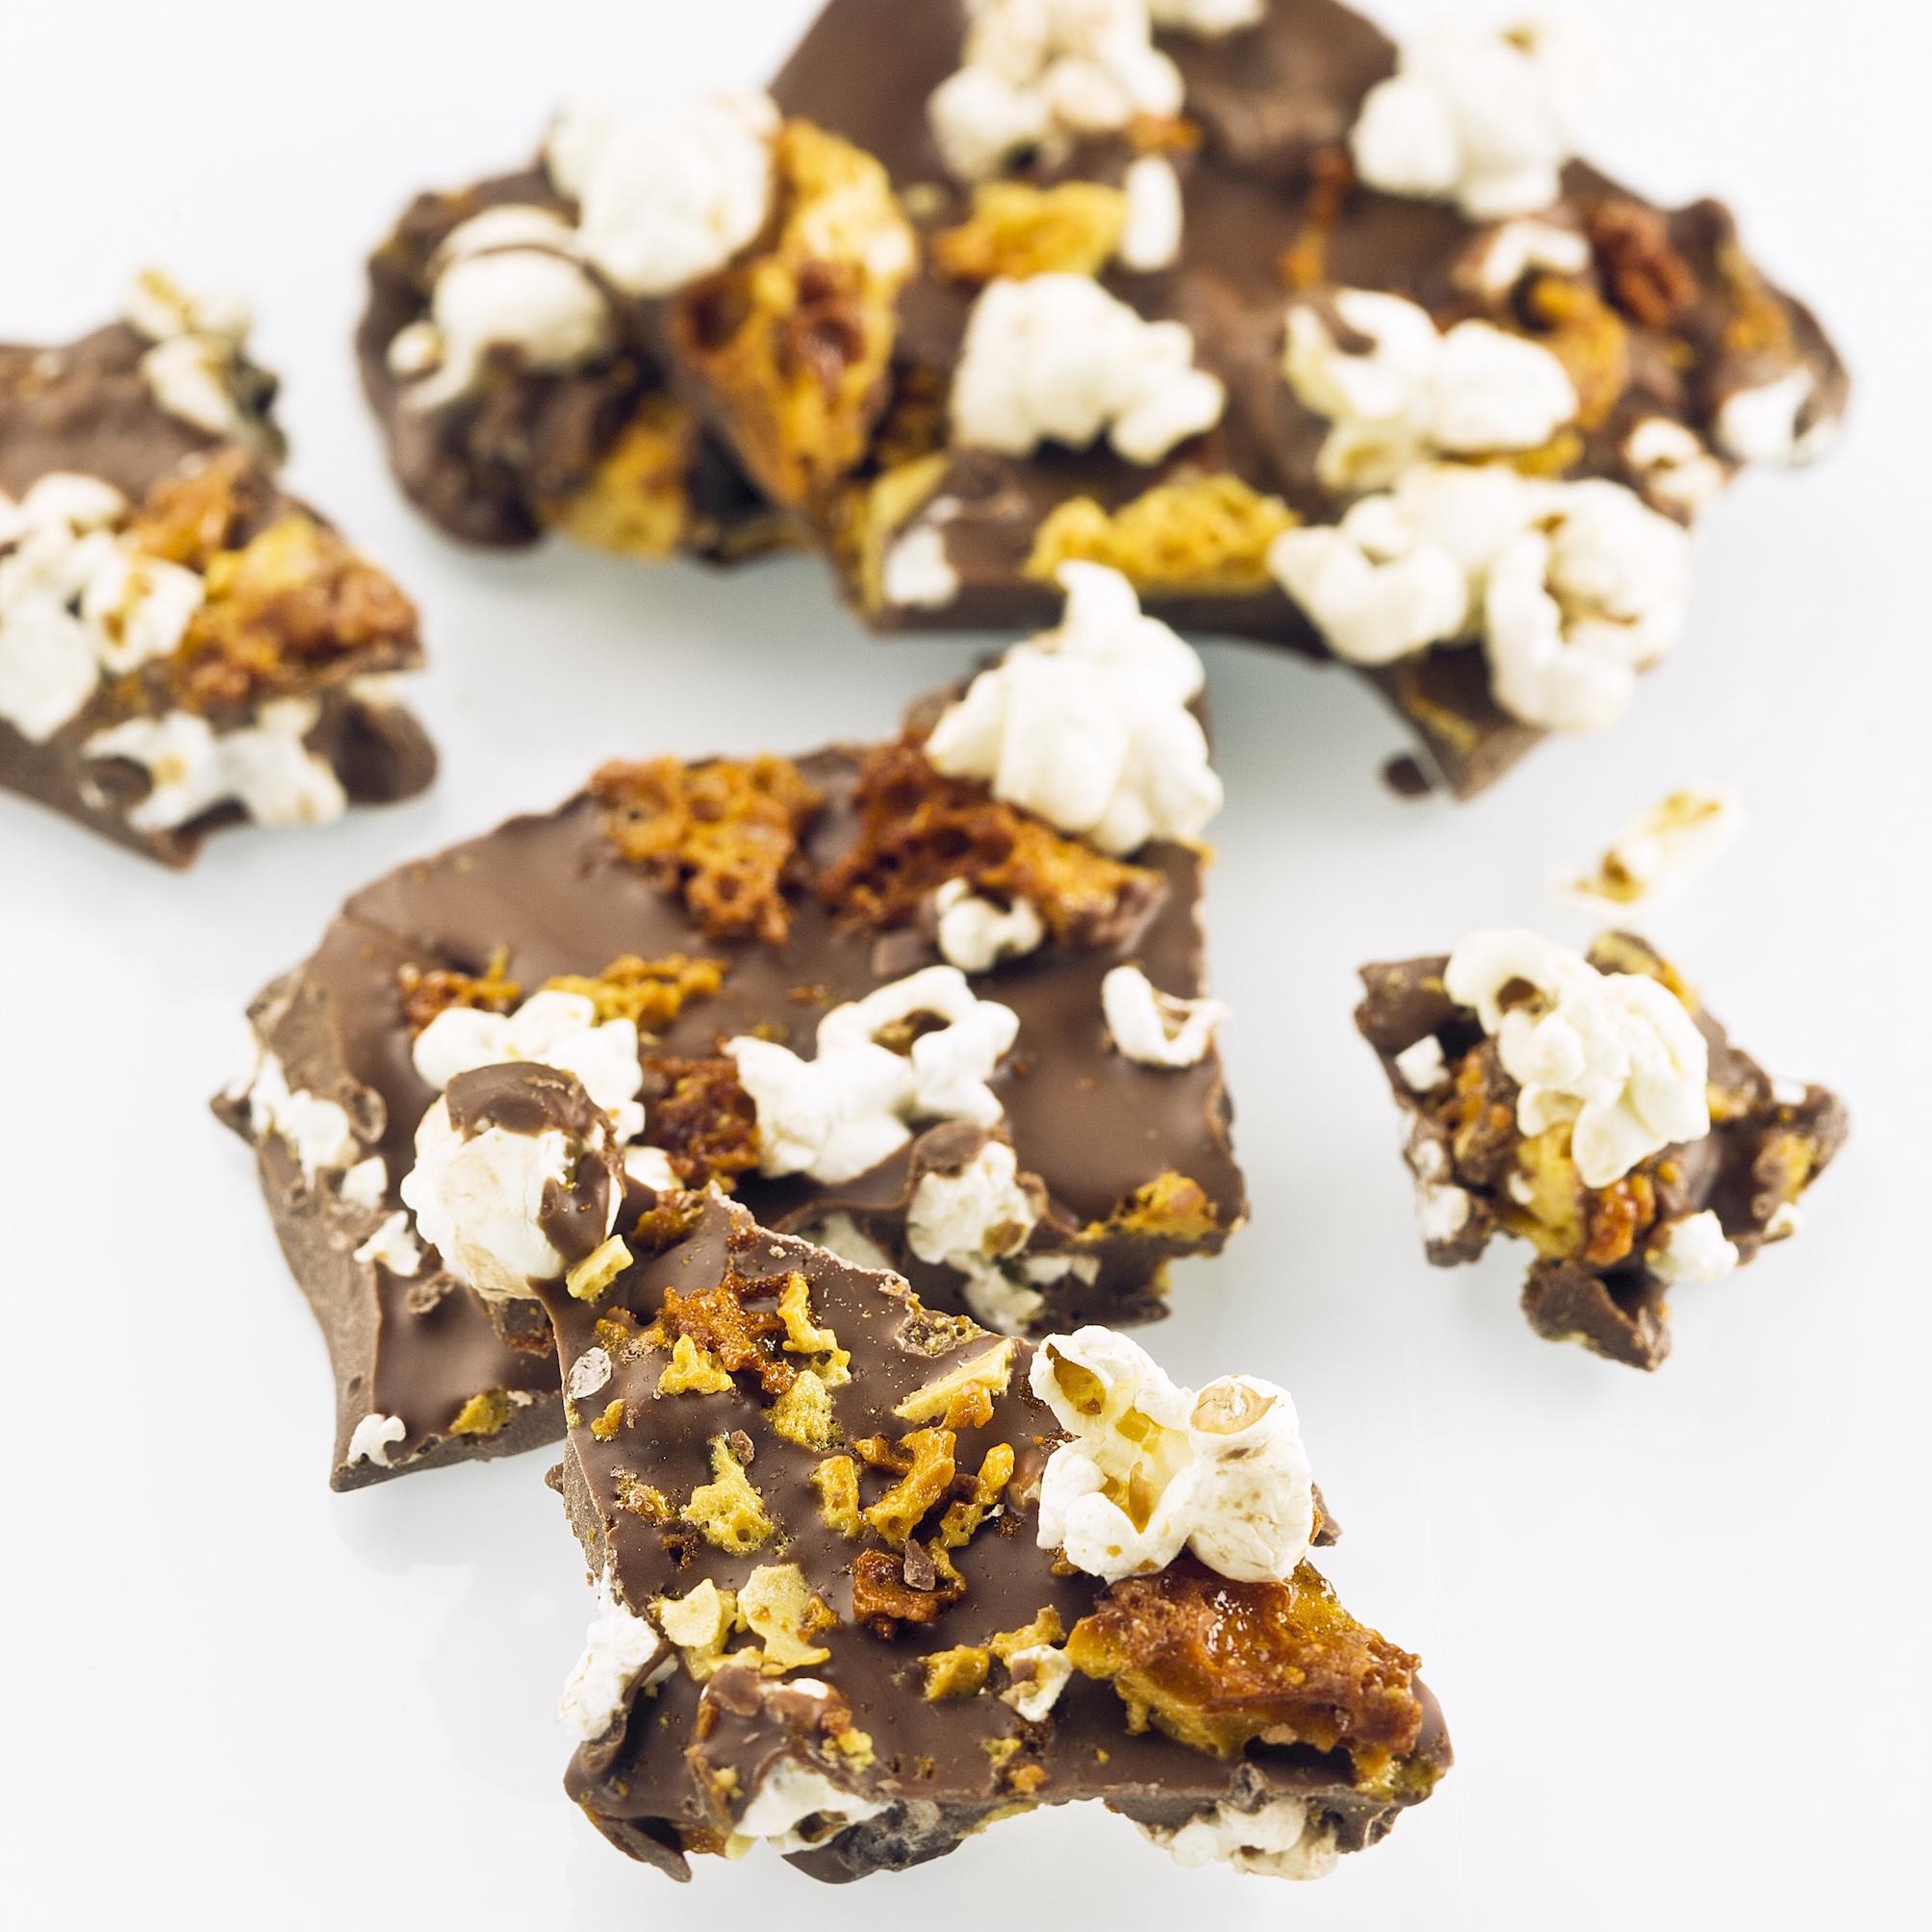 Darren Purchese Chocolate, Popcorn and Honeycomb Rubble Recipe